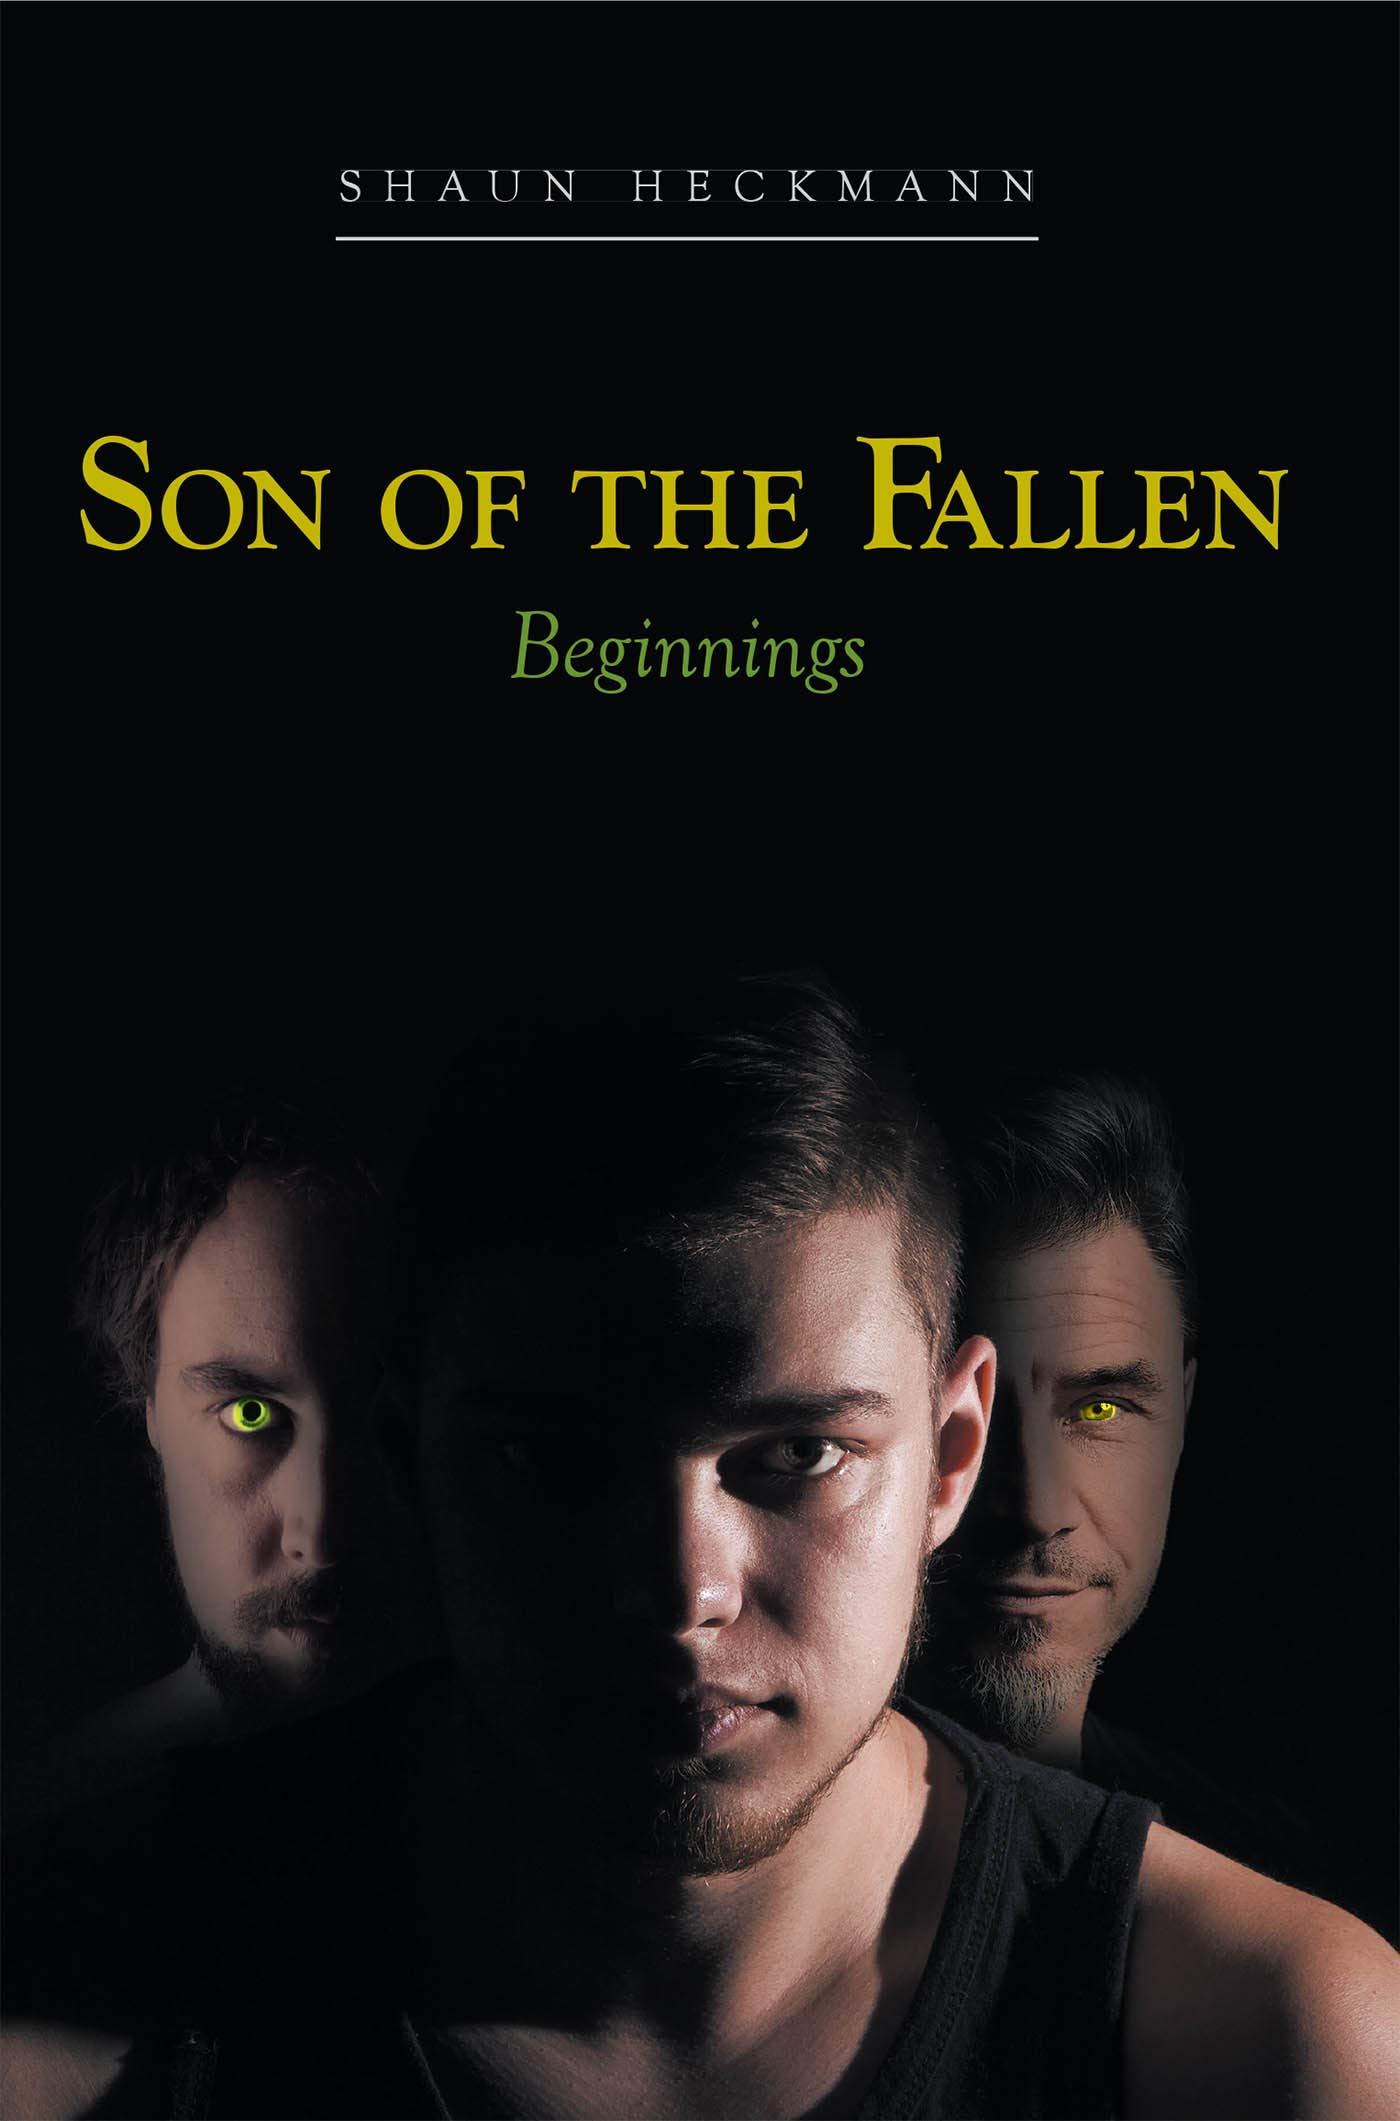 Son of the Fallen: Beginnings